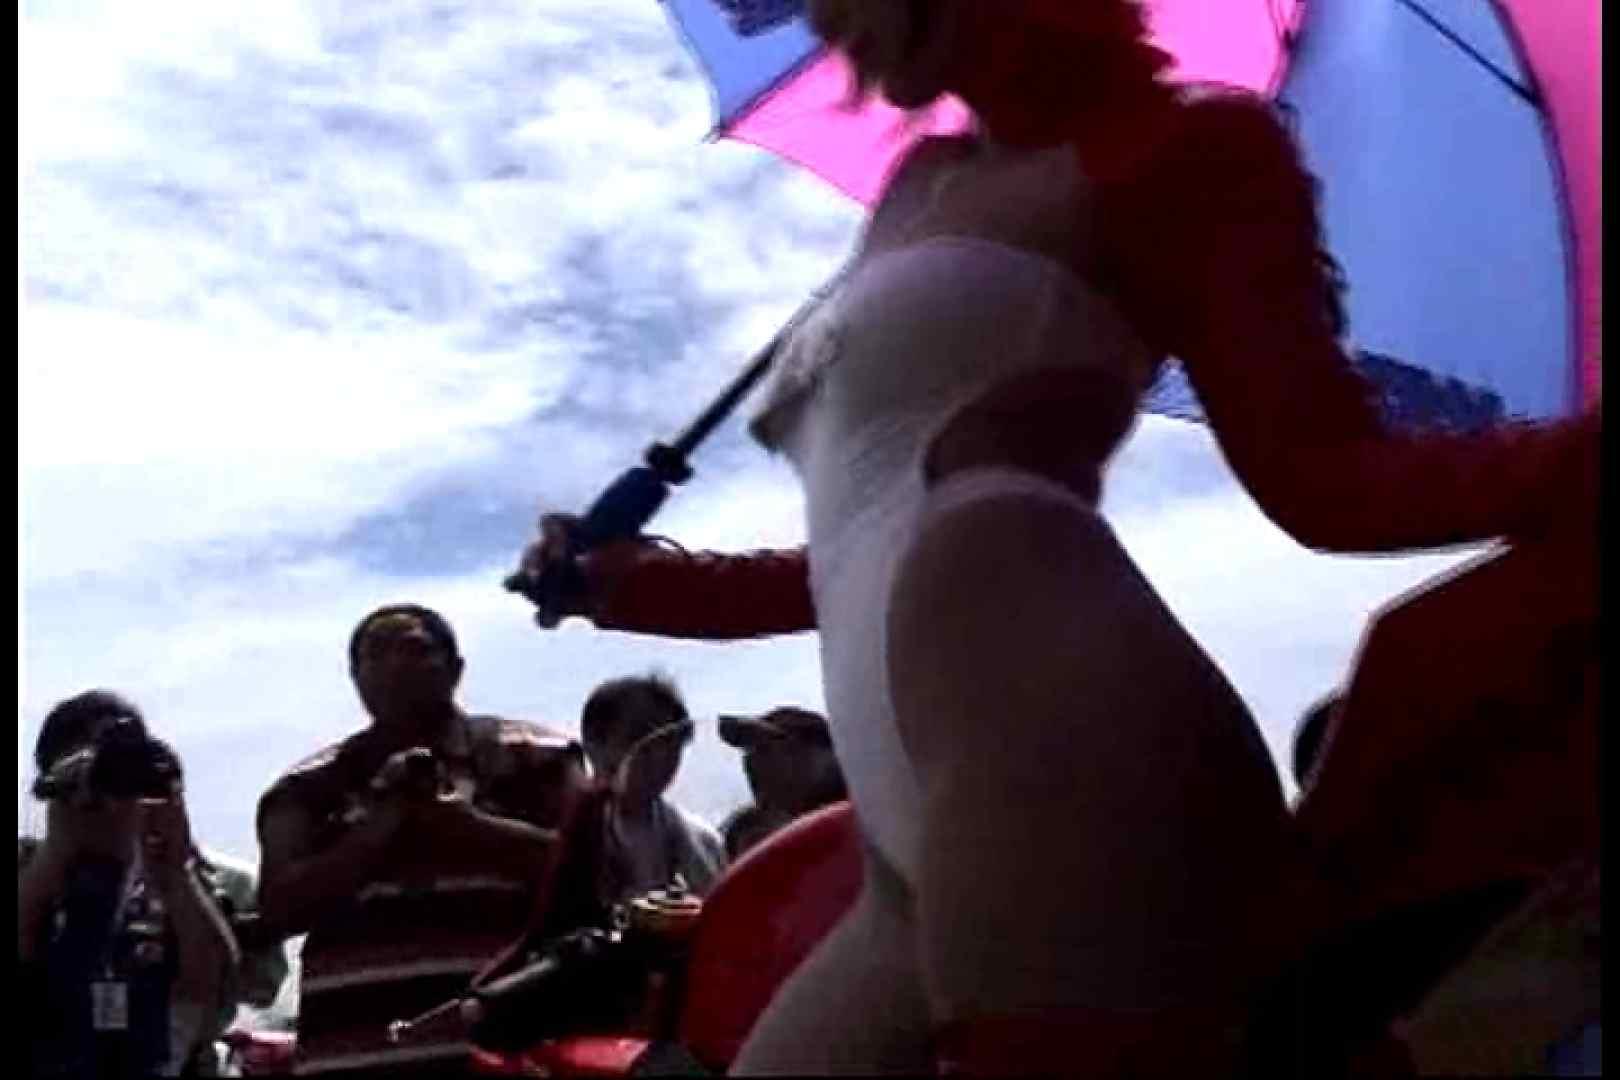 RQカメラ地獄Vol.5 レースクイーン編 | コスチューム  103画像 45